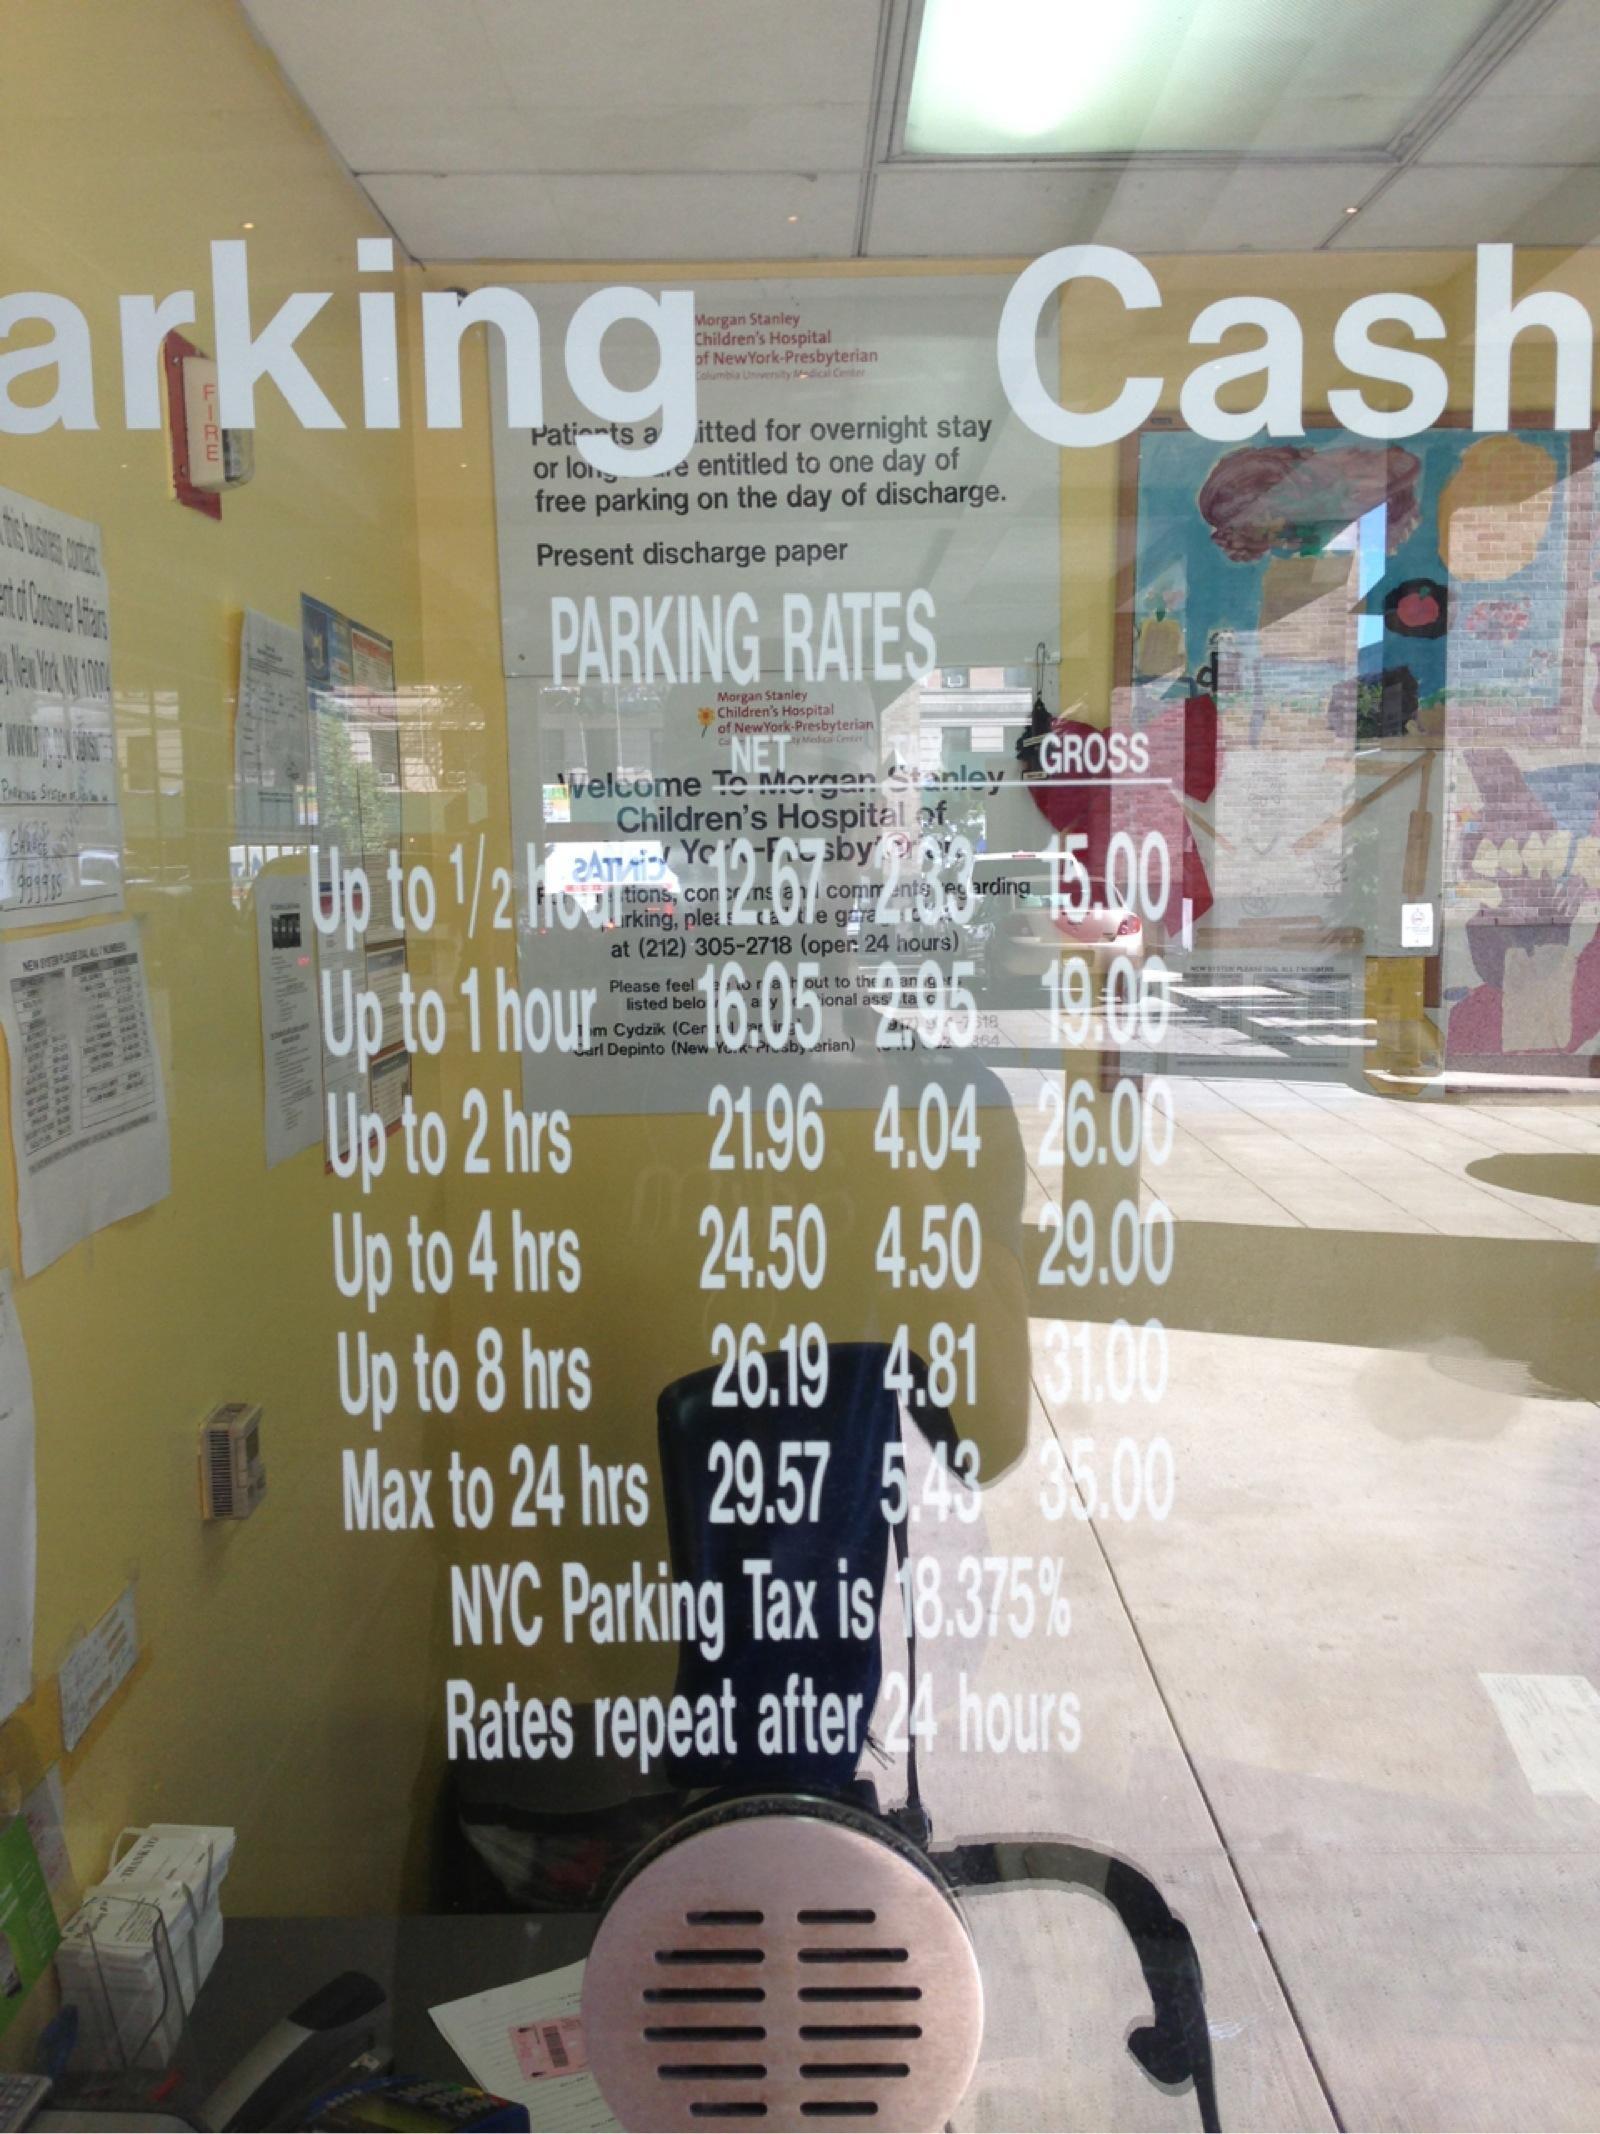 Morgan Stanley Children's Hospital - Parking in New York